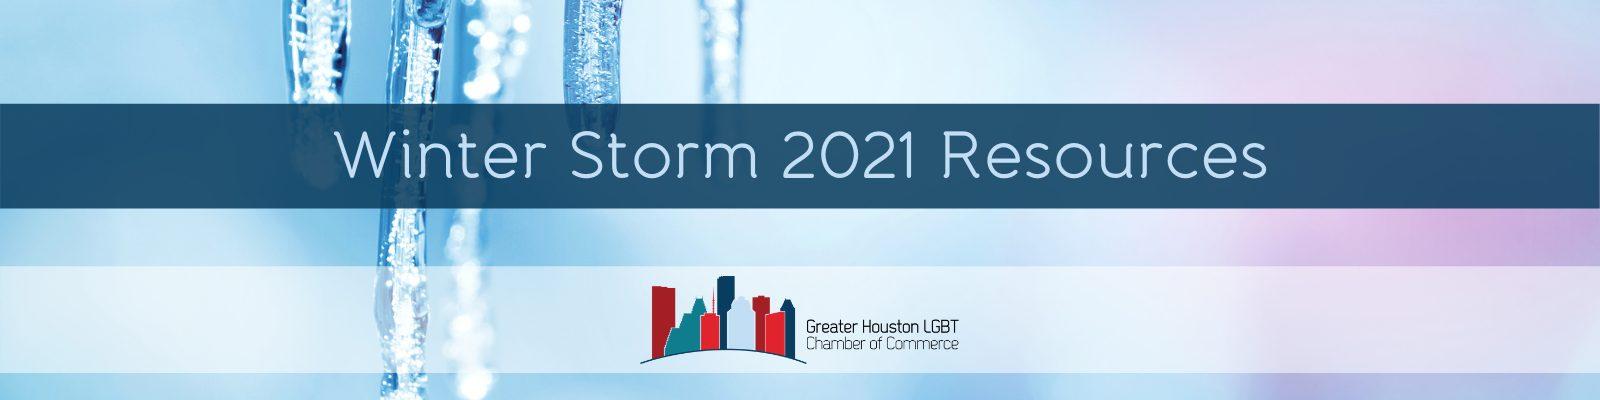 Winter Storm 2021 Resources Webpage Header-2